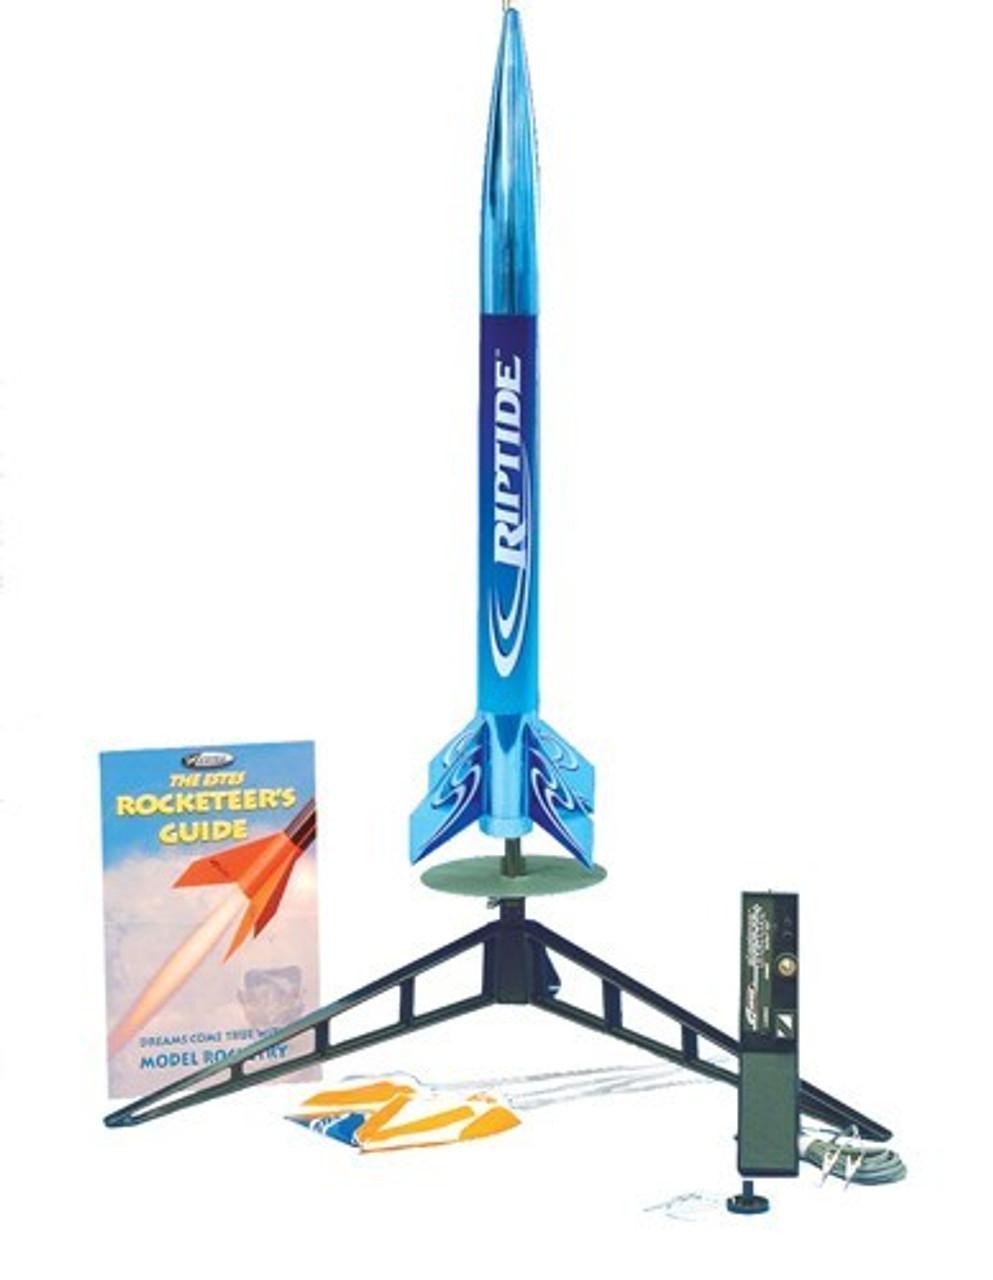 EST-1403  RTF Riptide Model Rocket Launch Set